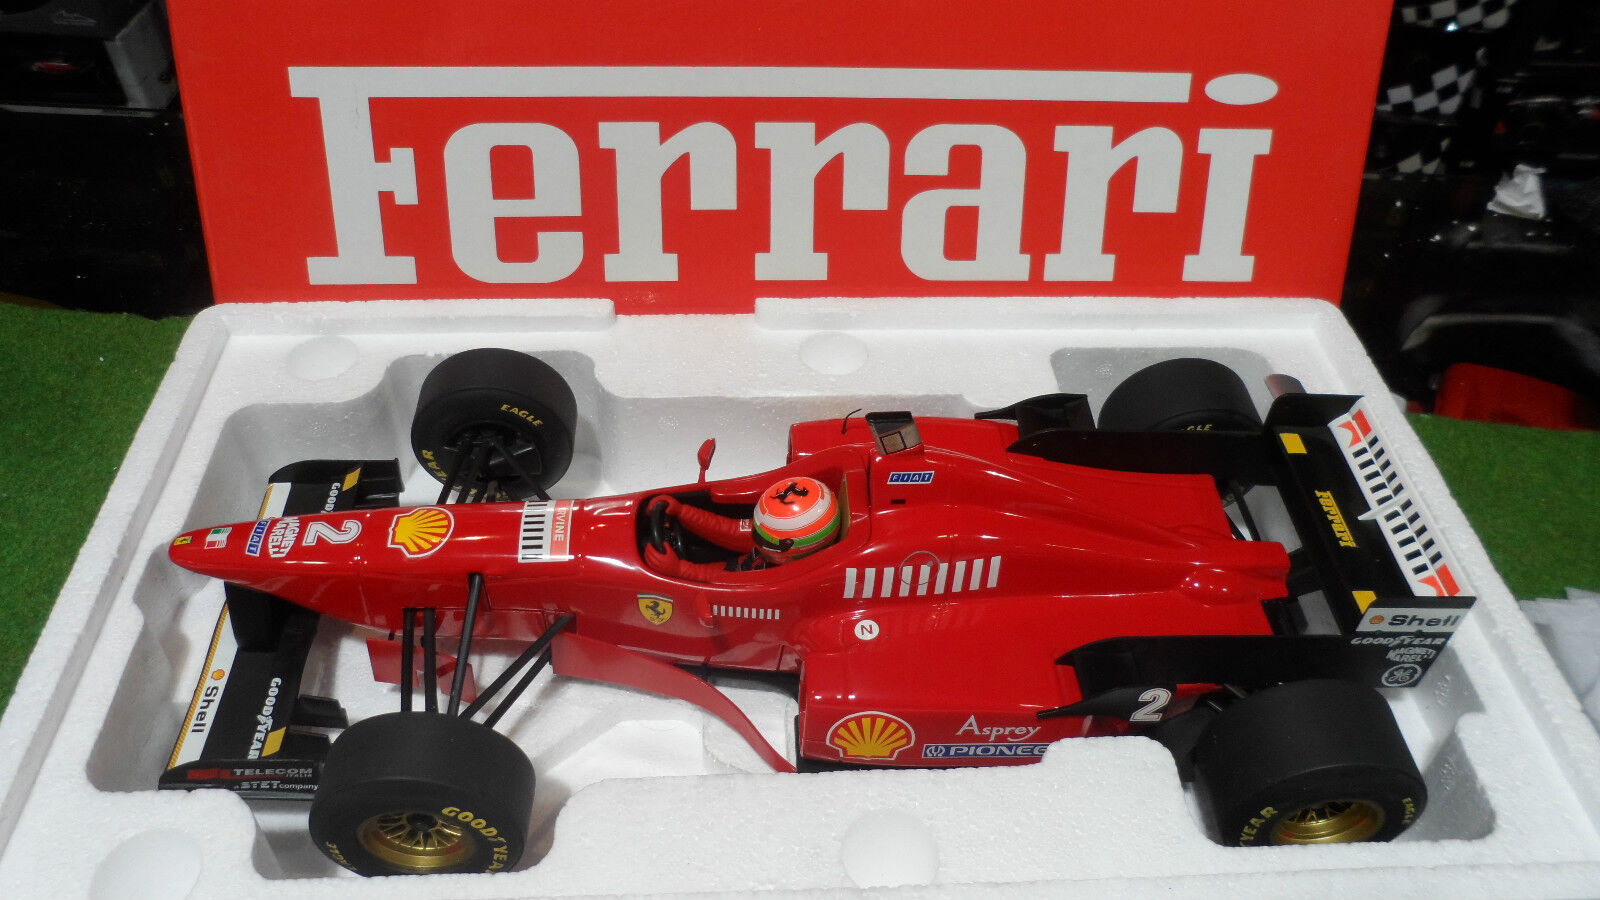 F1 FERRARI 1996 F310 2 formule 1 IRVINE 1 12 MINICHAMPS 120960022 voiture miniat